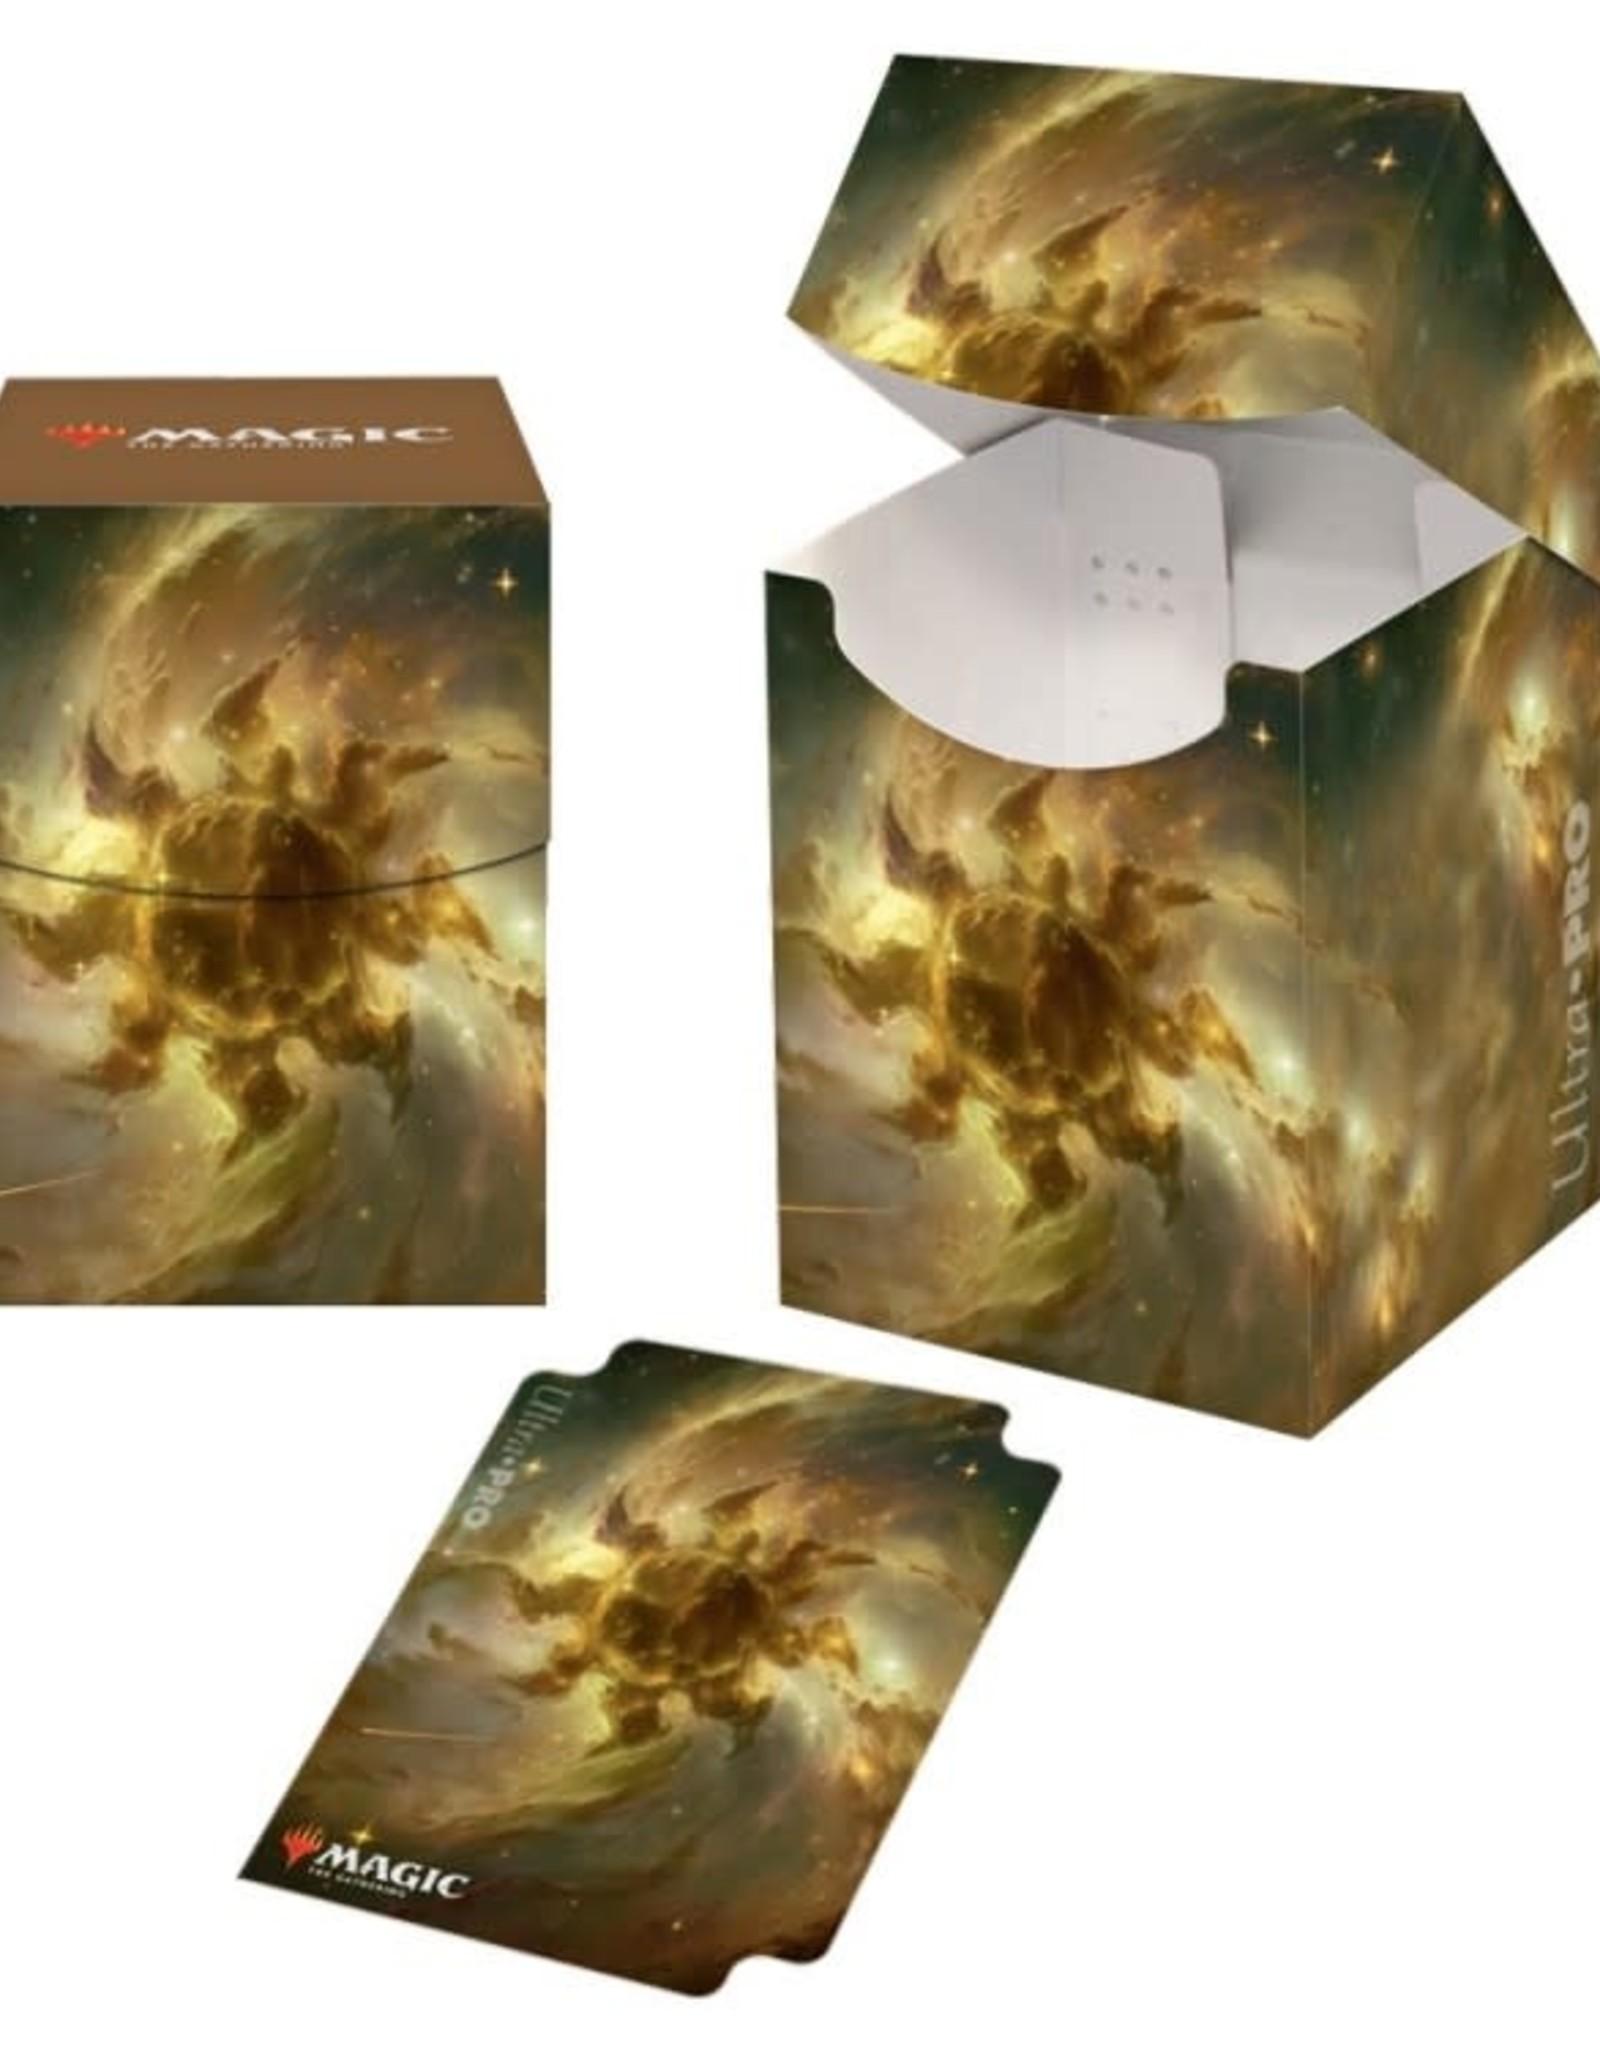 Ultra Pro Deck Box: MtG Pro 100 + Celestial Plains